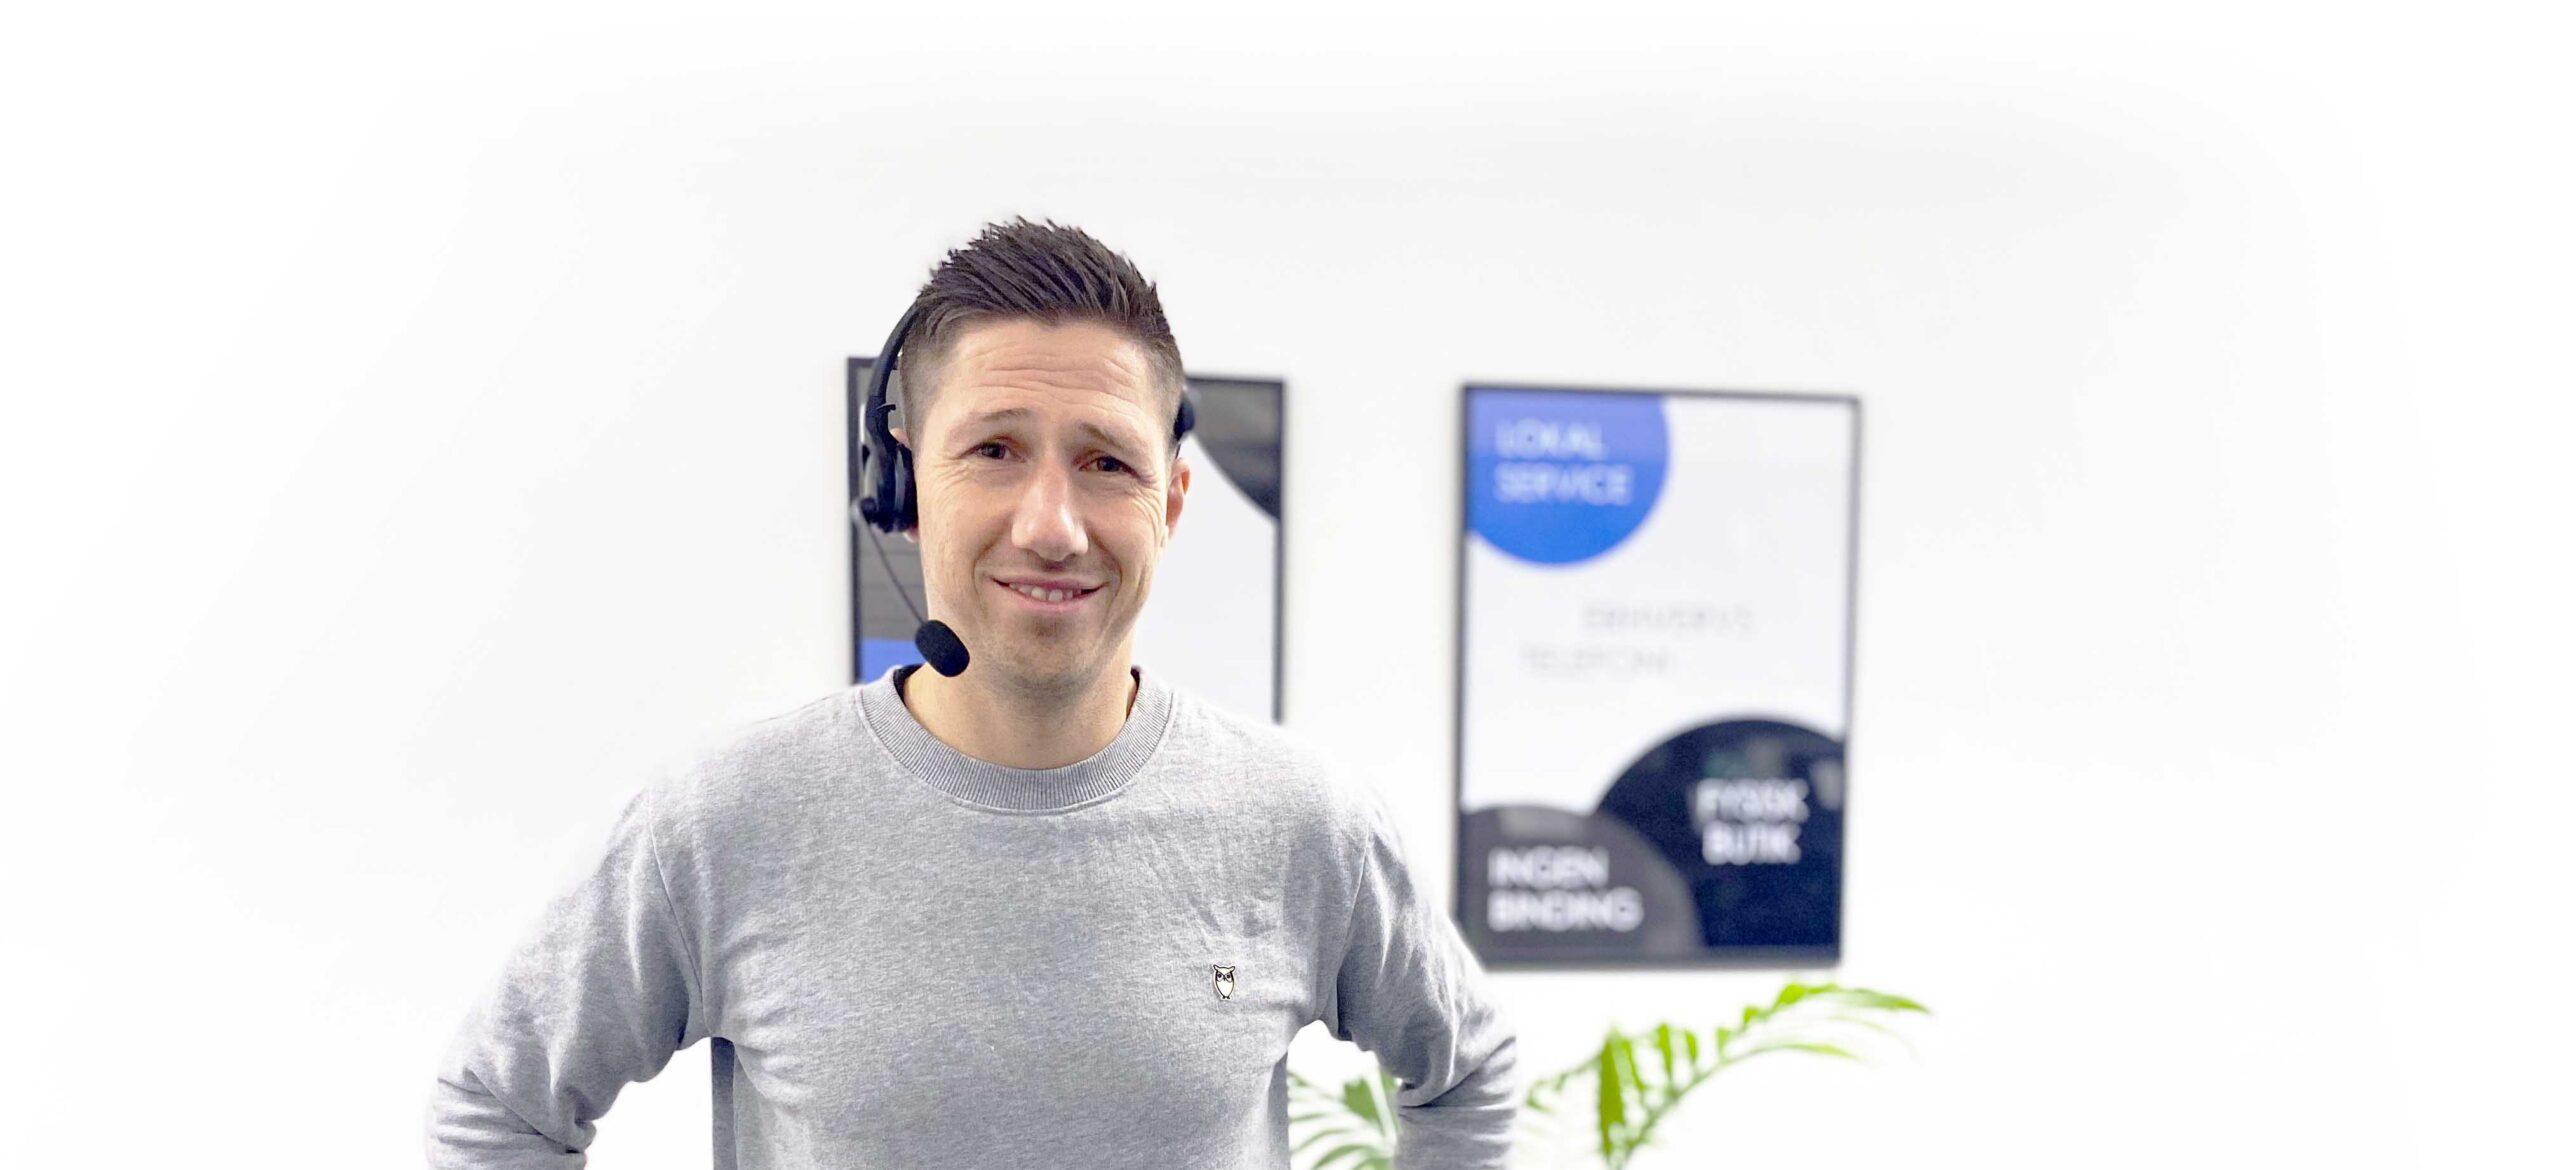 Marcello Cilea er ansvarlig for erhvervstelefoni i Viborg